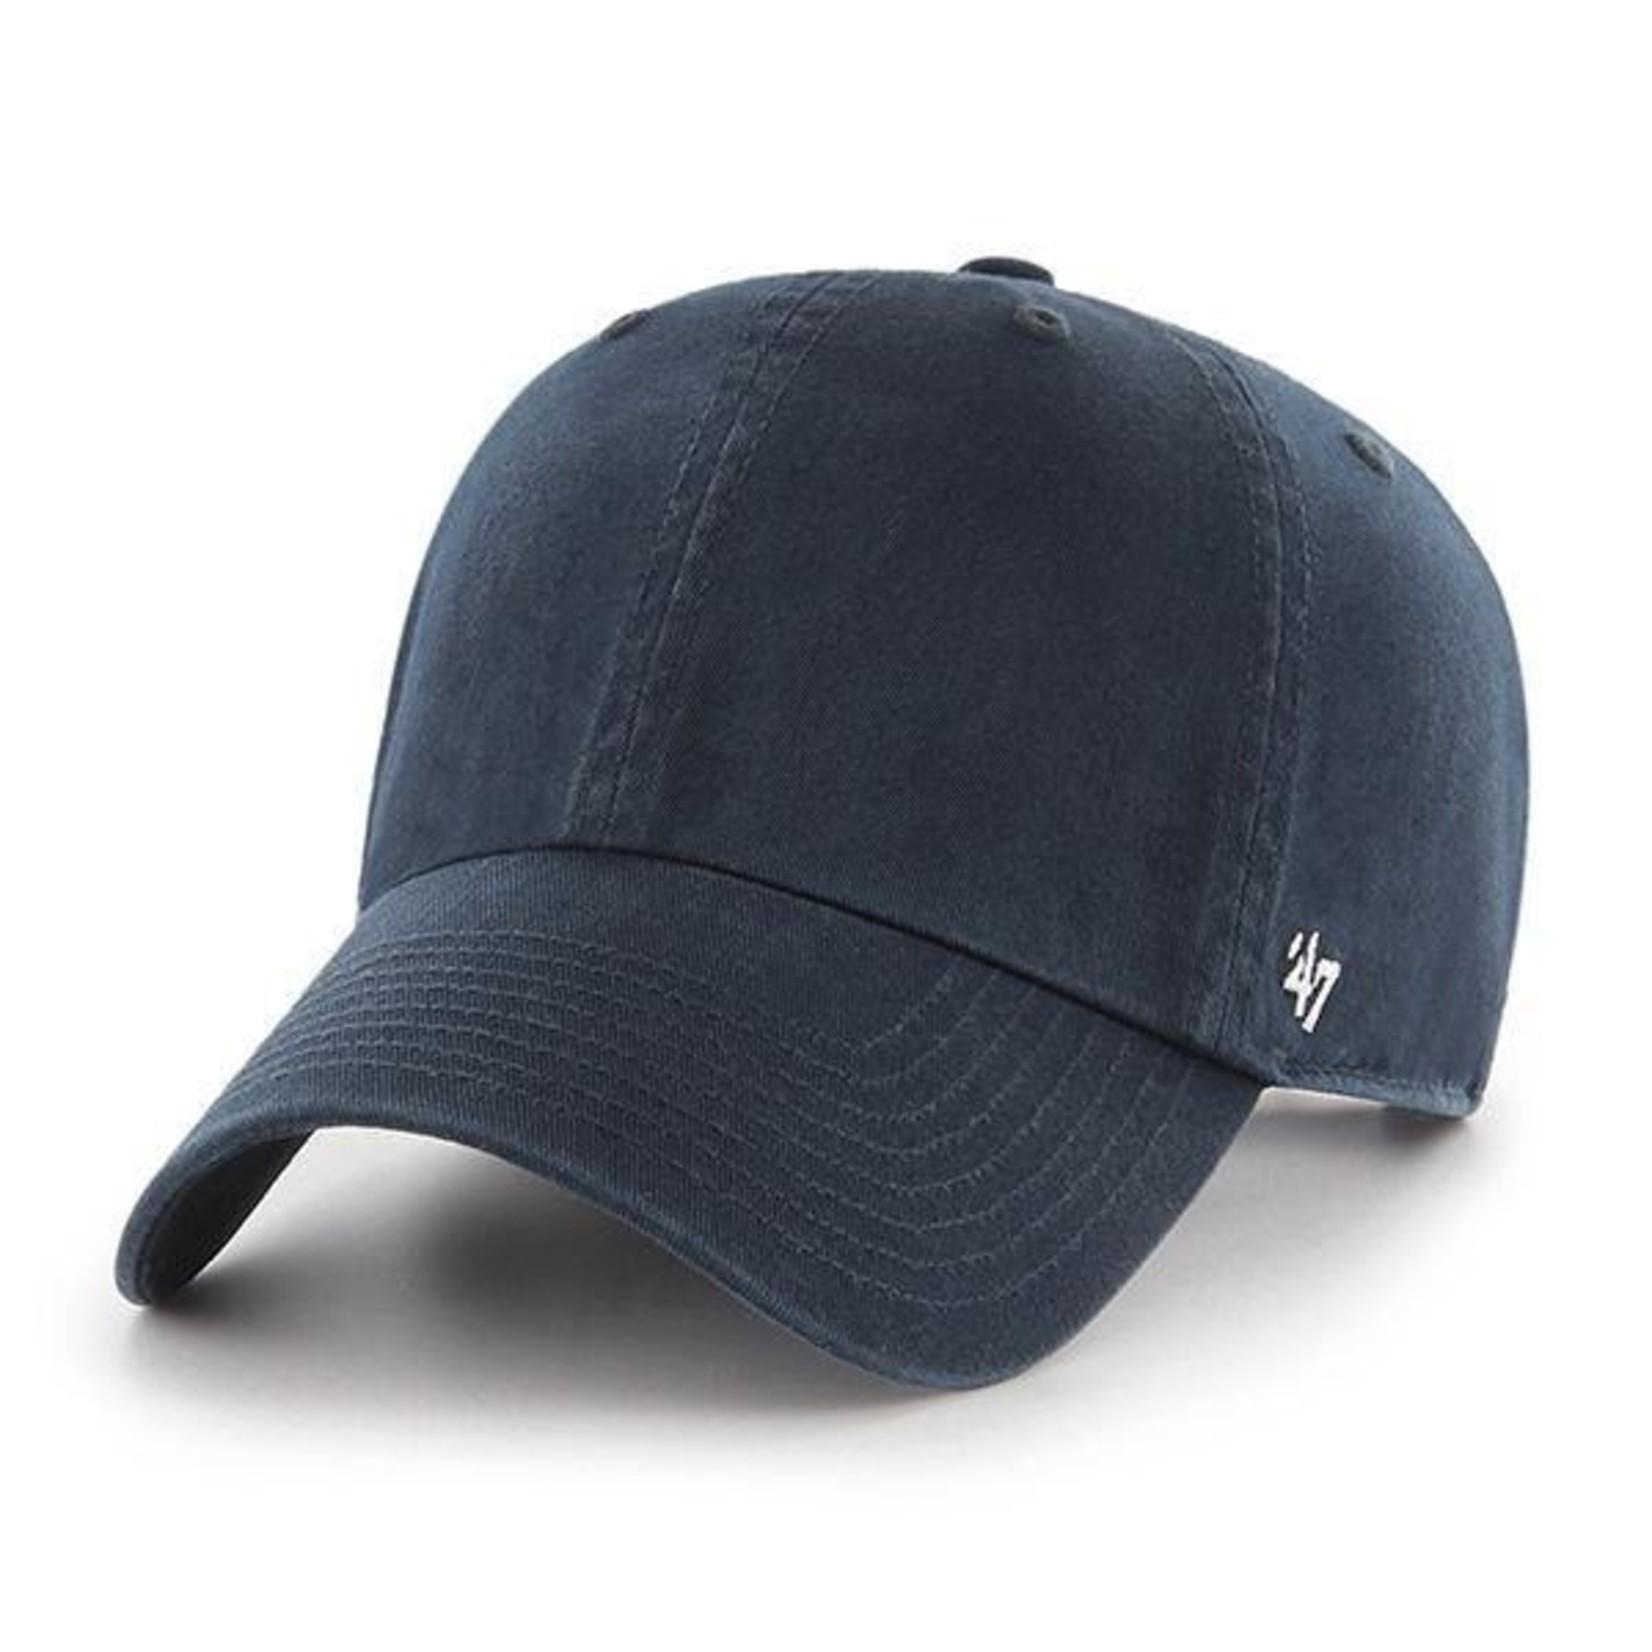 47 Brand Classic Clean Up Baseball Cap - Navy